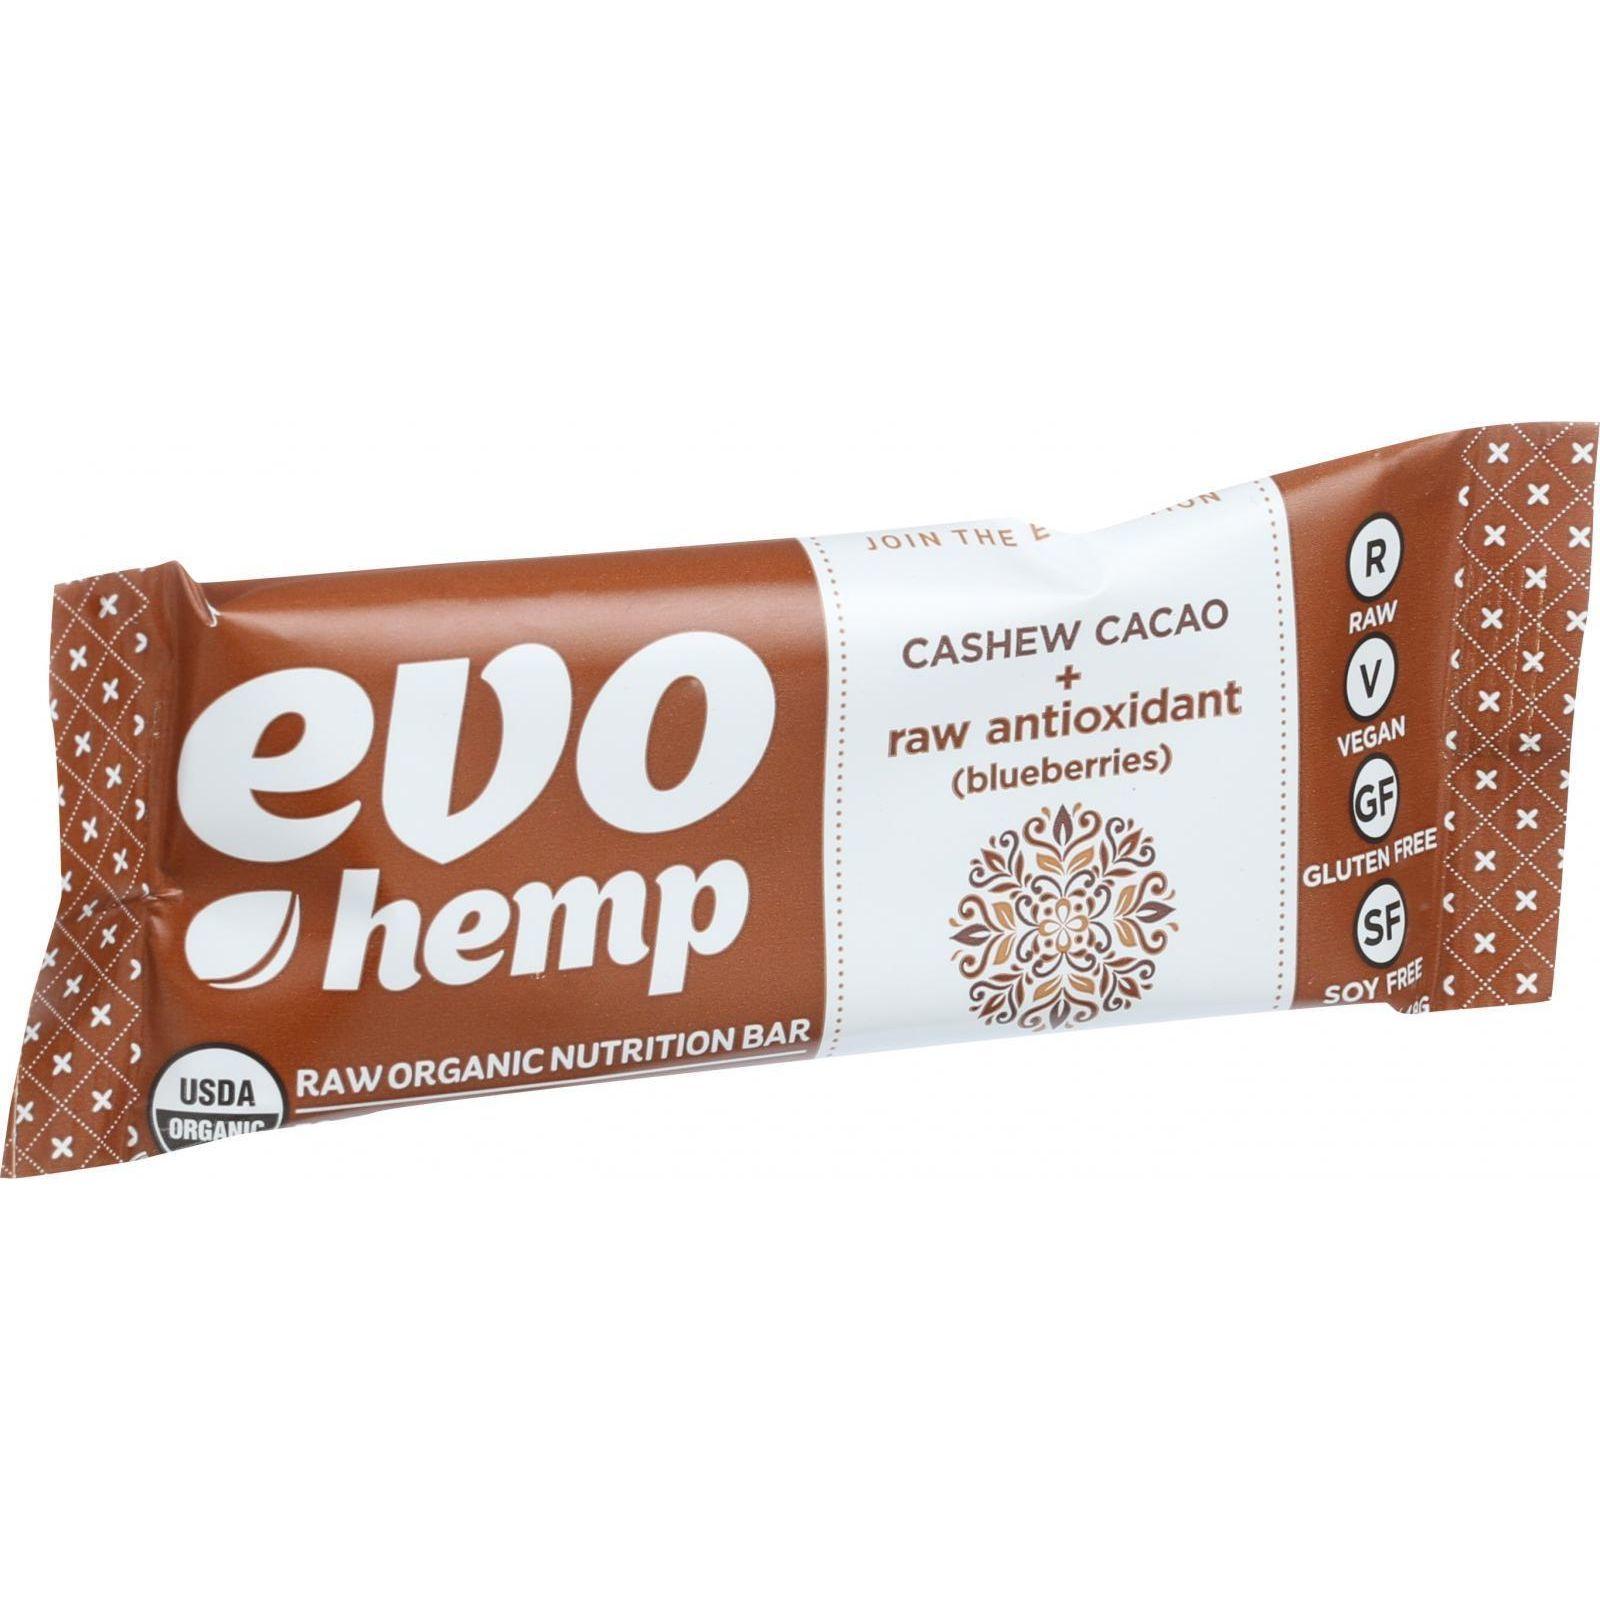 Evo Hemp Organic Hemp Bars - Cashew Cacao Antioxidant - 1.69 oz Bars - Case of 12